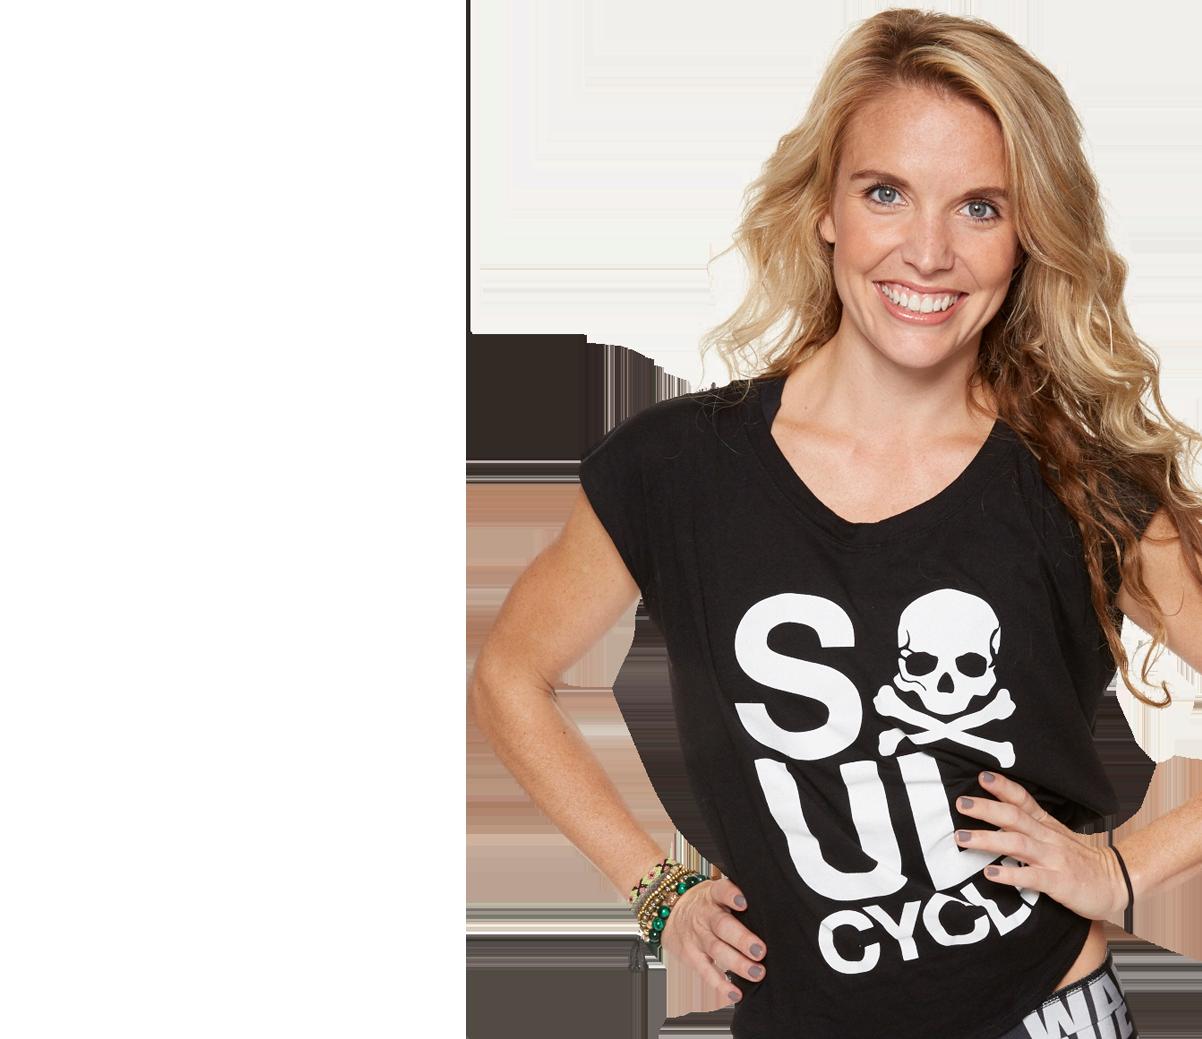 Soul Cycle Emily Turner www.AnnaKooiman.com fitness travel lifestyle